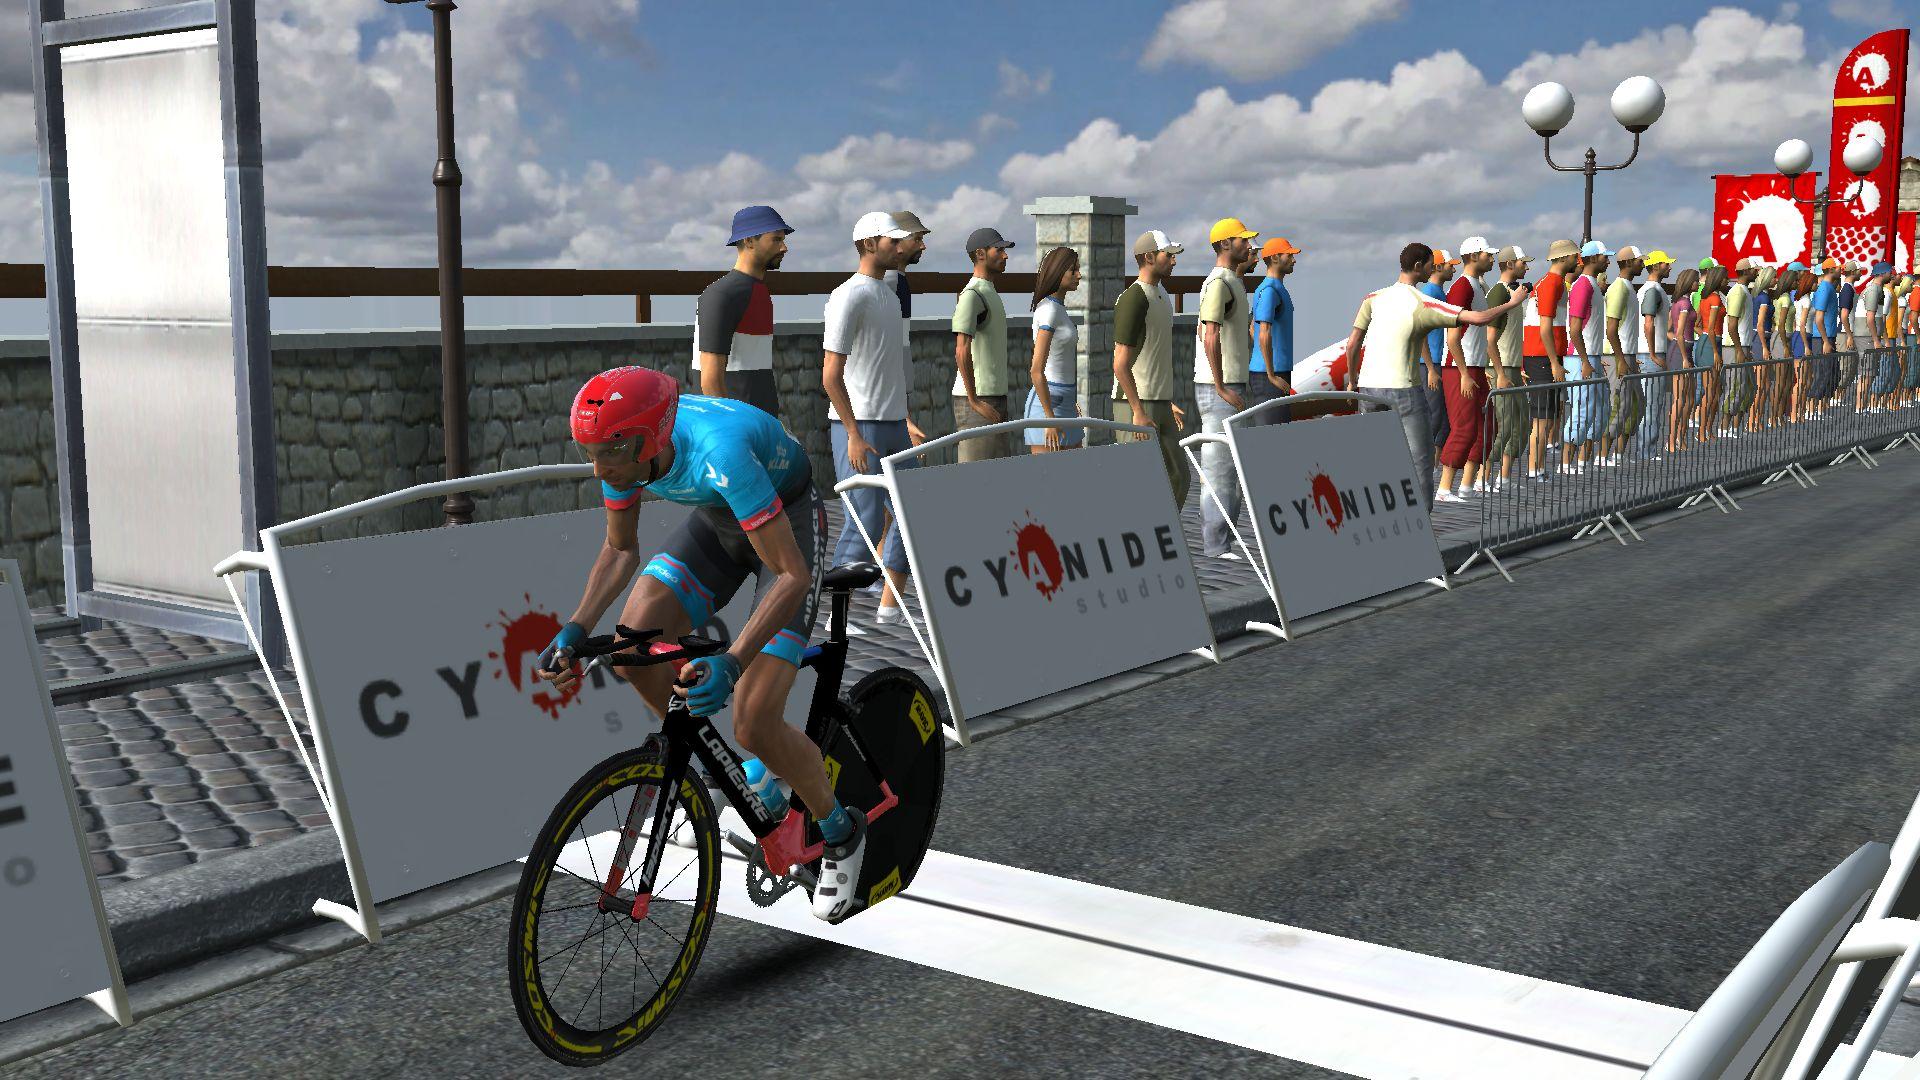 pcmdaily.com/images/mg/2019/Races/GTM/Giro/mg19_giro_09_PCM0052.jpg